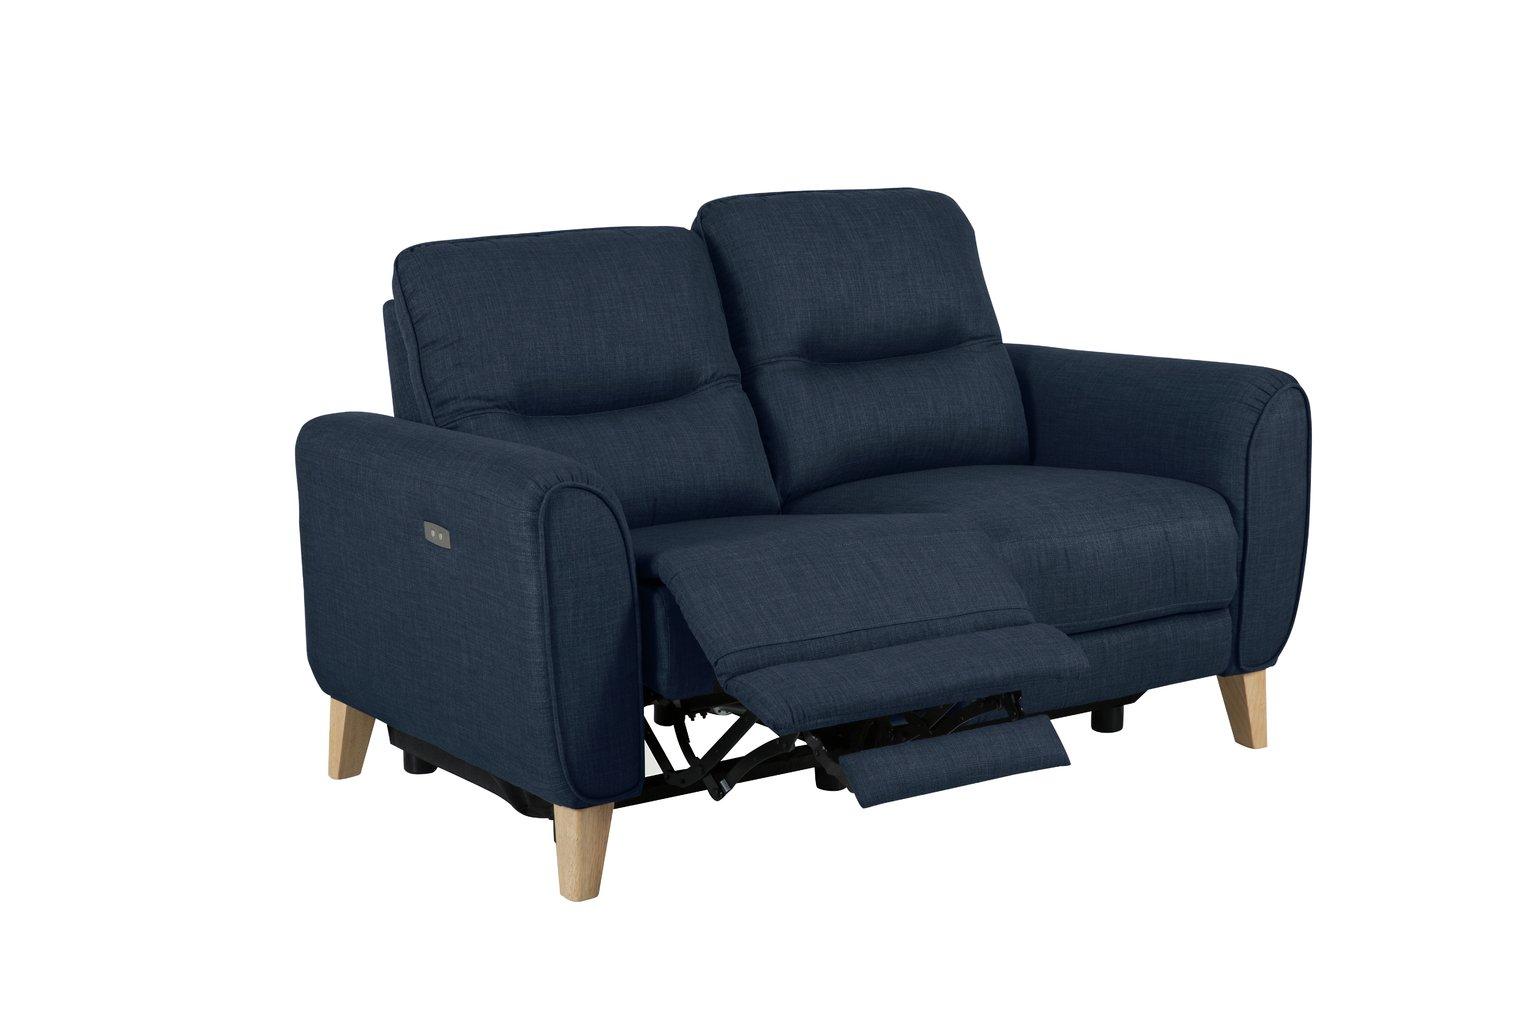 Habitat Tommy 2 Seater Fabric Recliner Sofa - Navy